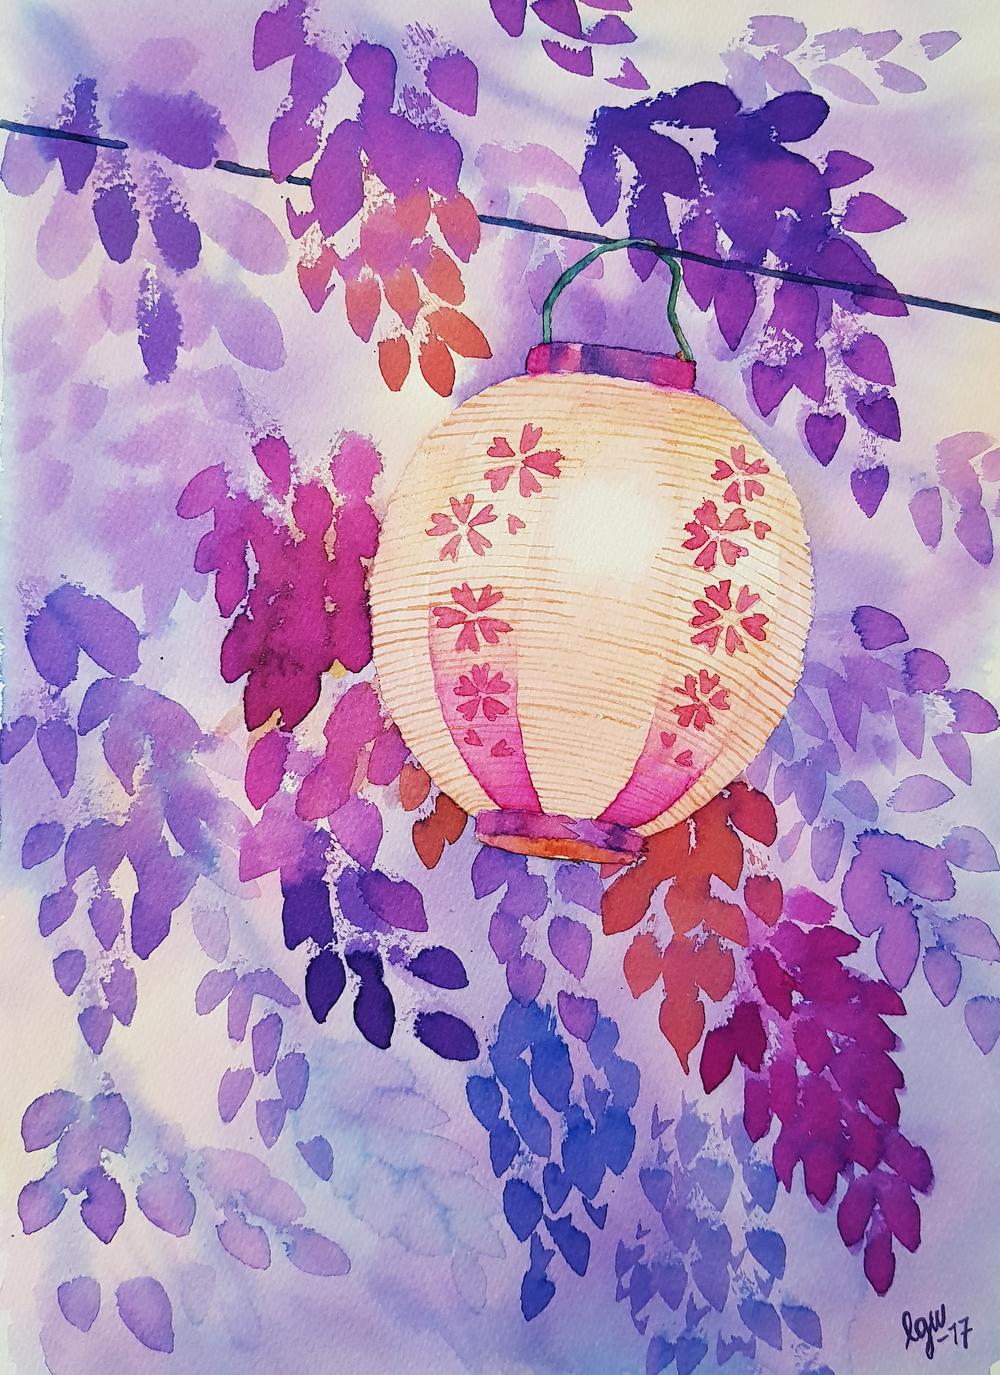 hanami_akvarell_lisa grelsson wiik.png